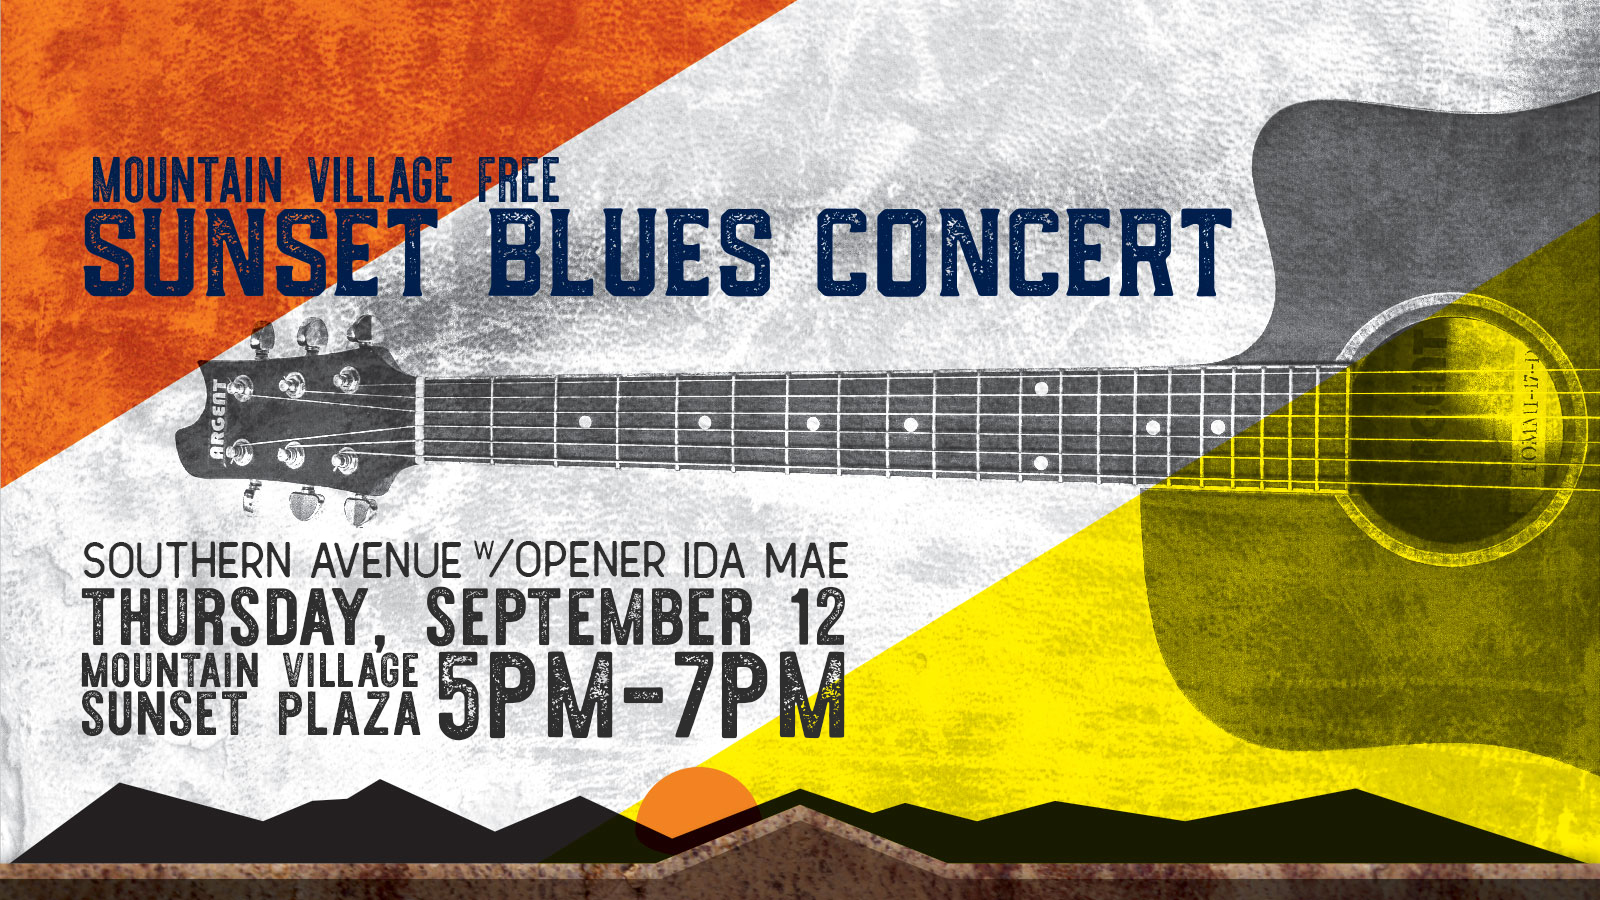 Sunset Blues Concert